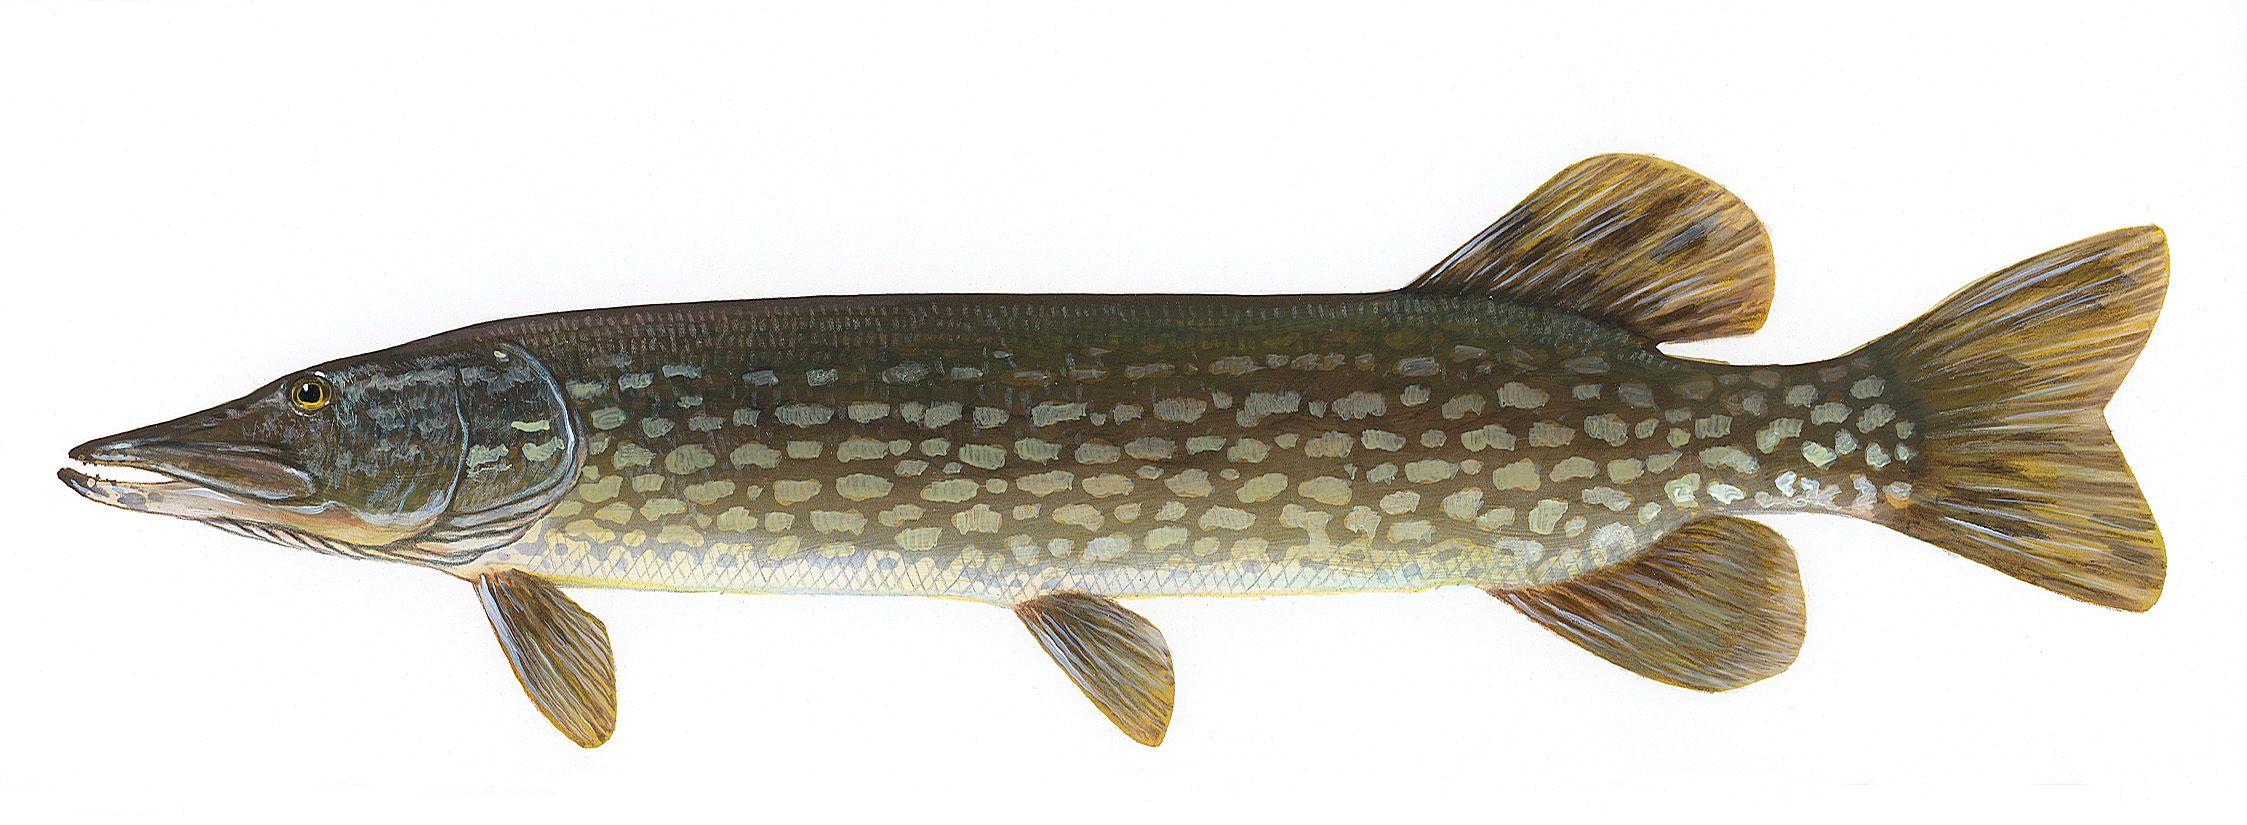 Northern Pike Fish Species